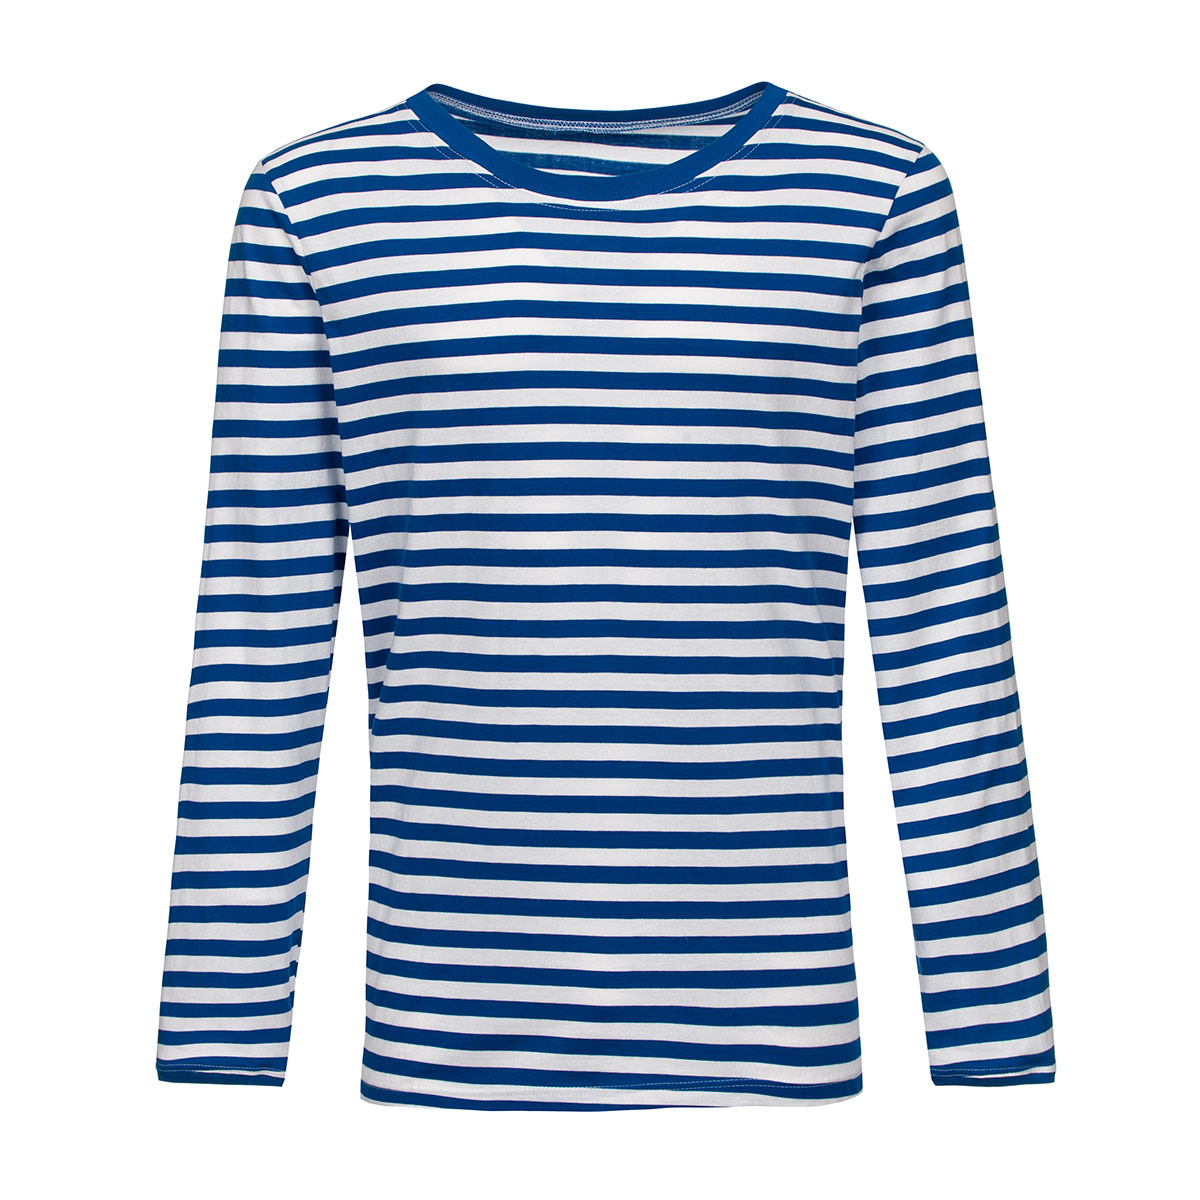 ringelshirt blau wei kinder f r clown pirat matrose. Black Bedroom Furniture Sets. Home Design Ideas